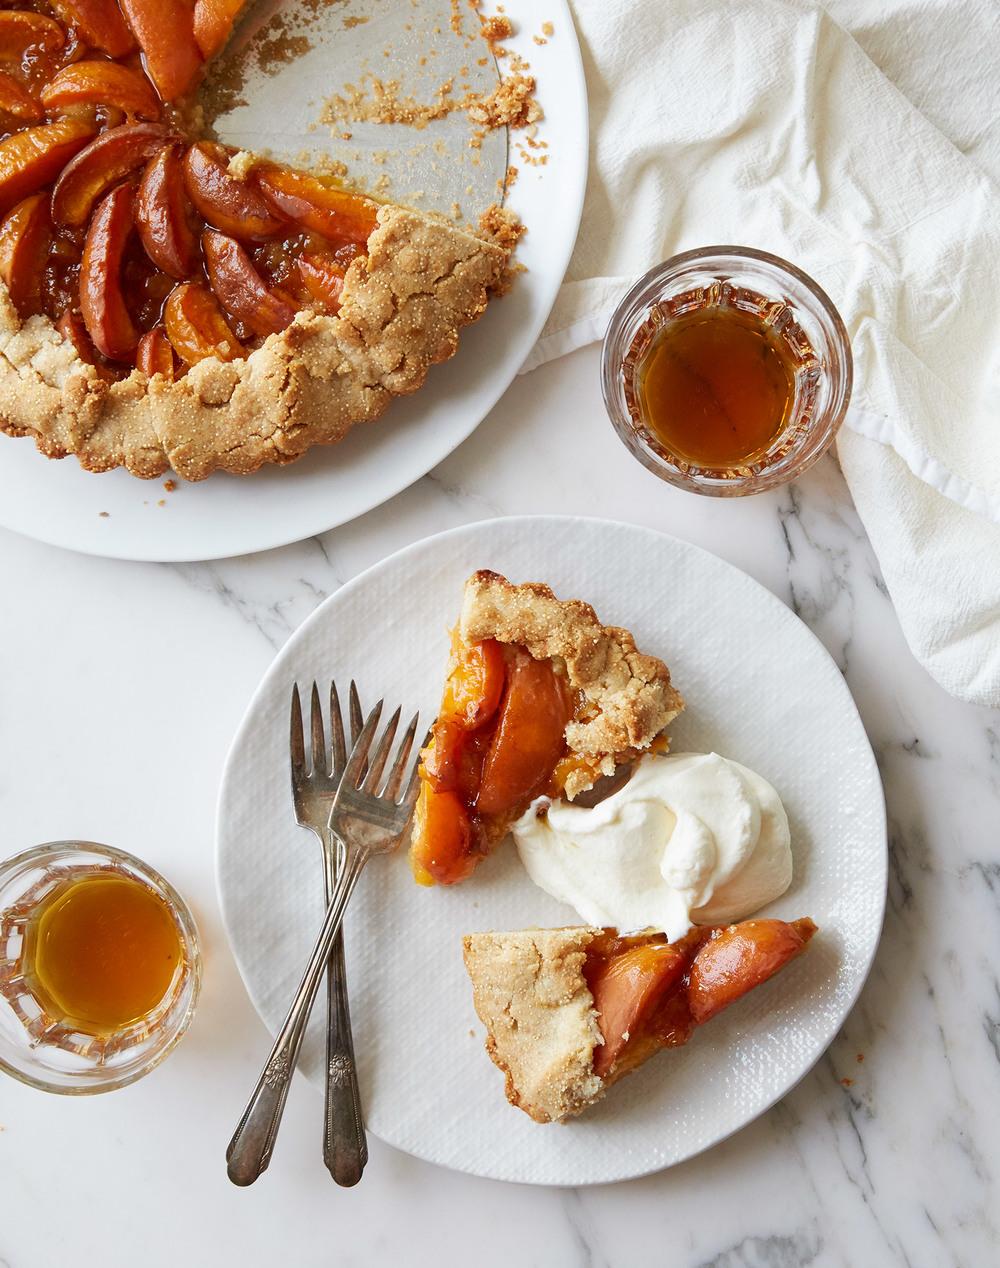 gluten free apricot amaranth galette tart and amaro